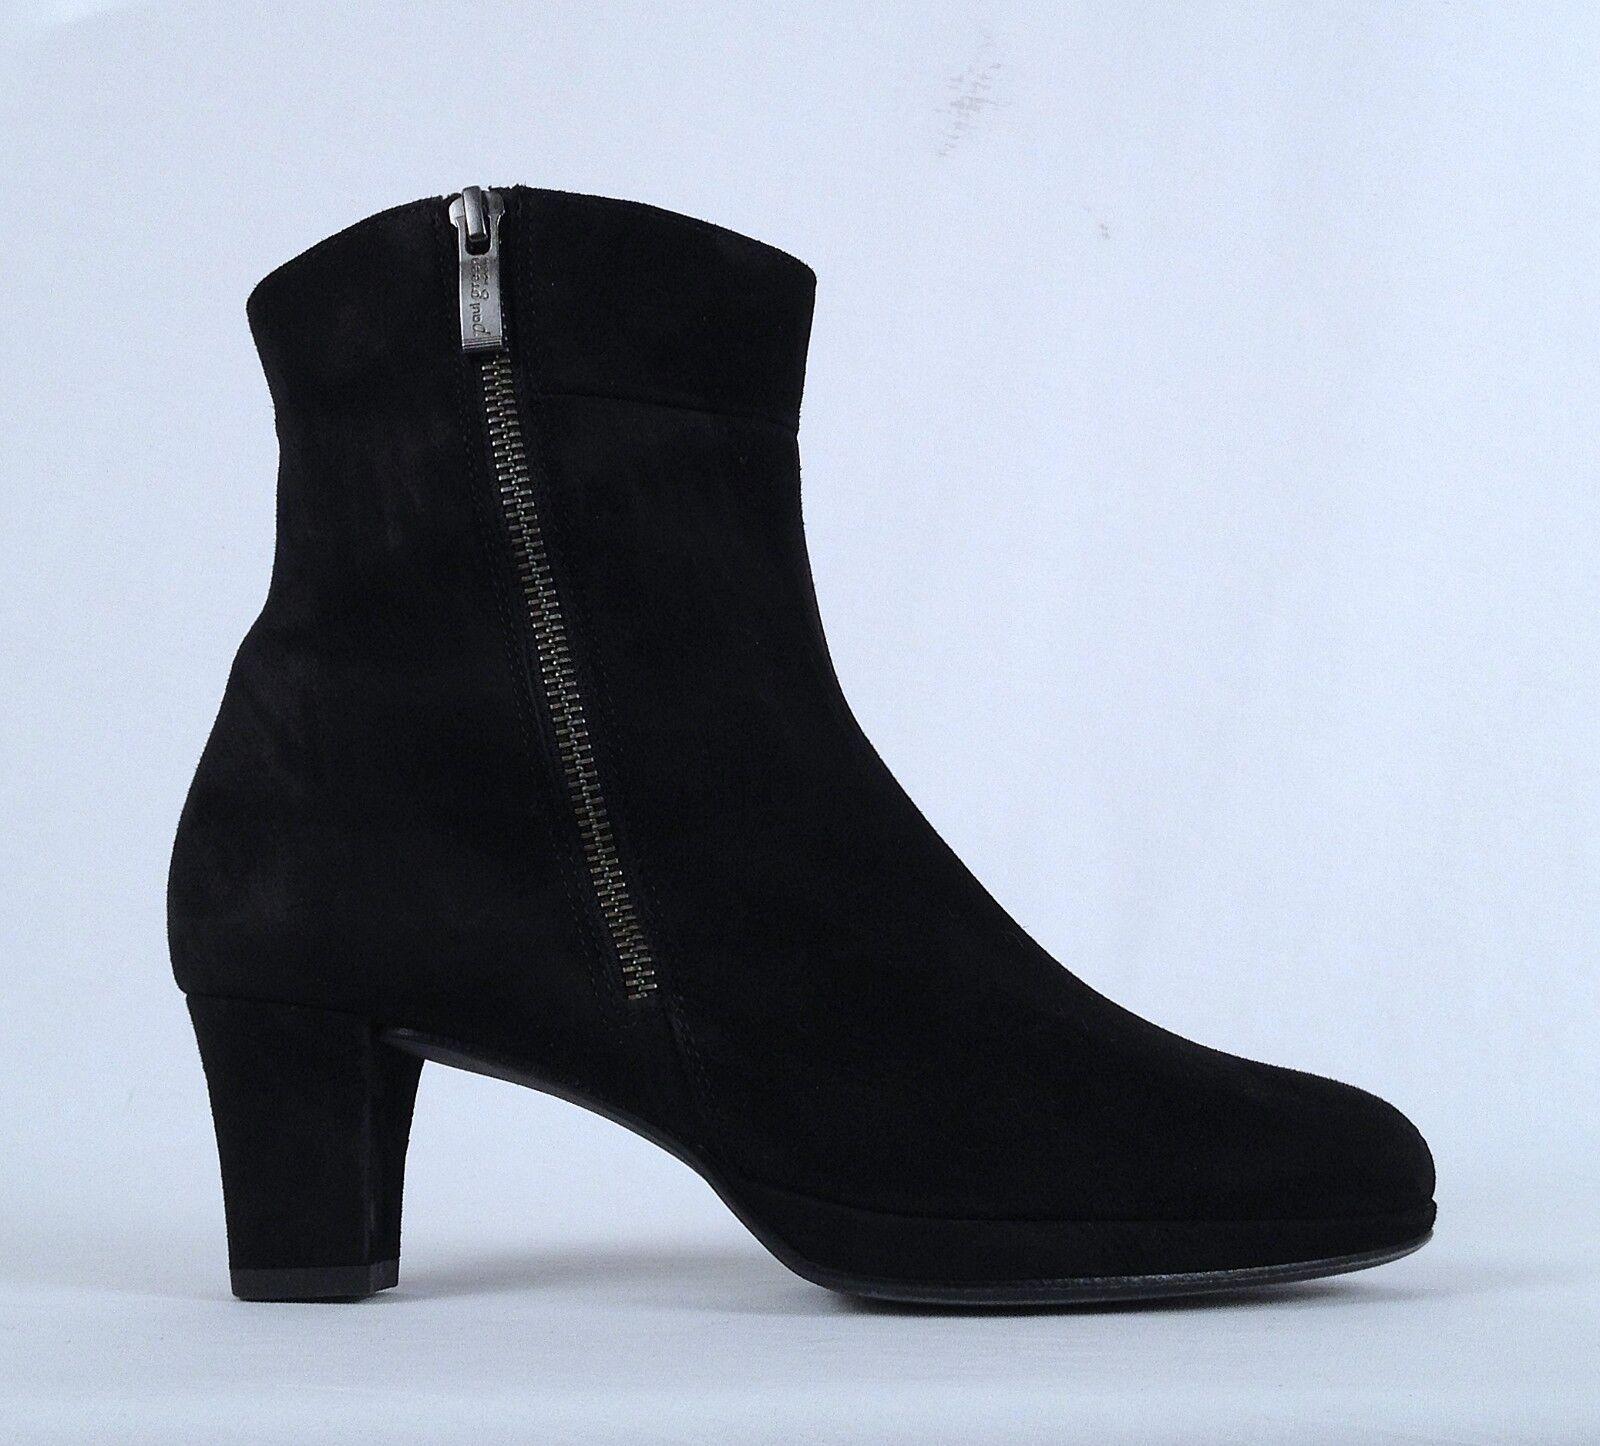 Paul Green 'Abbey' Boot- Black- Size 6 US    3.5 AU  380   (BBB1) e9c761